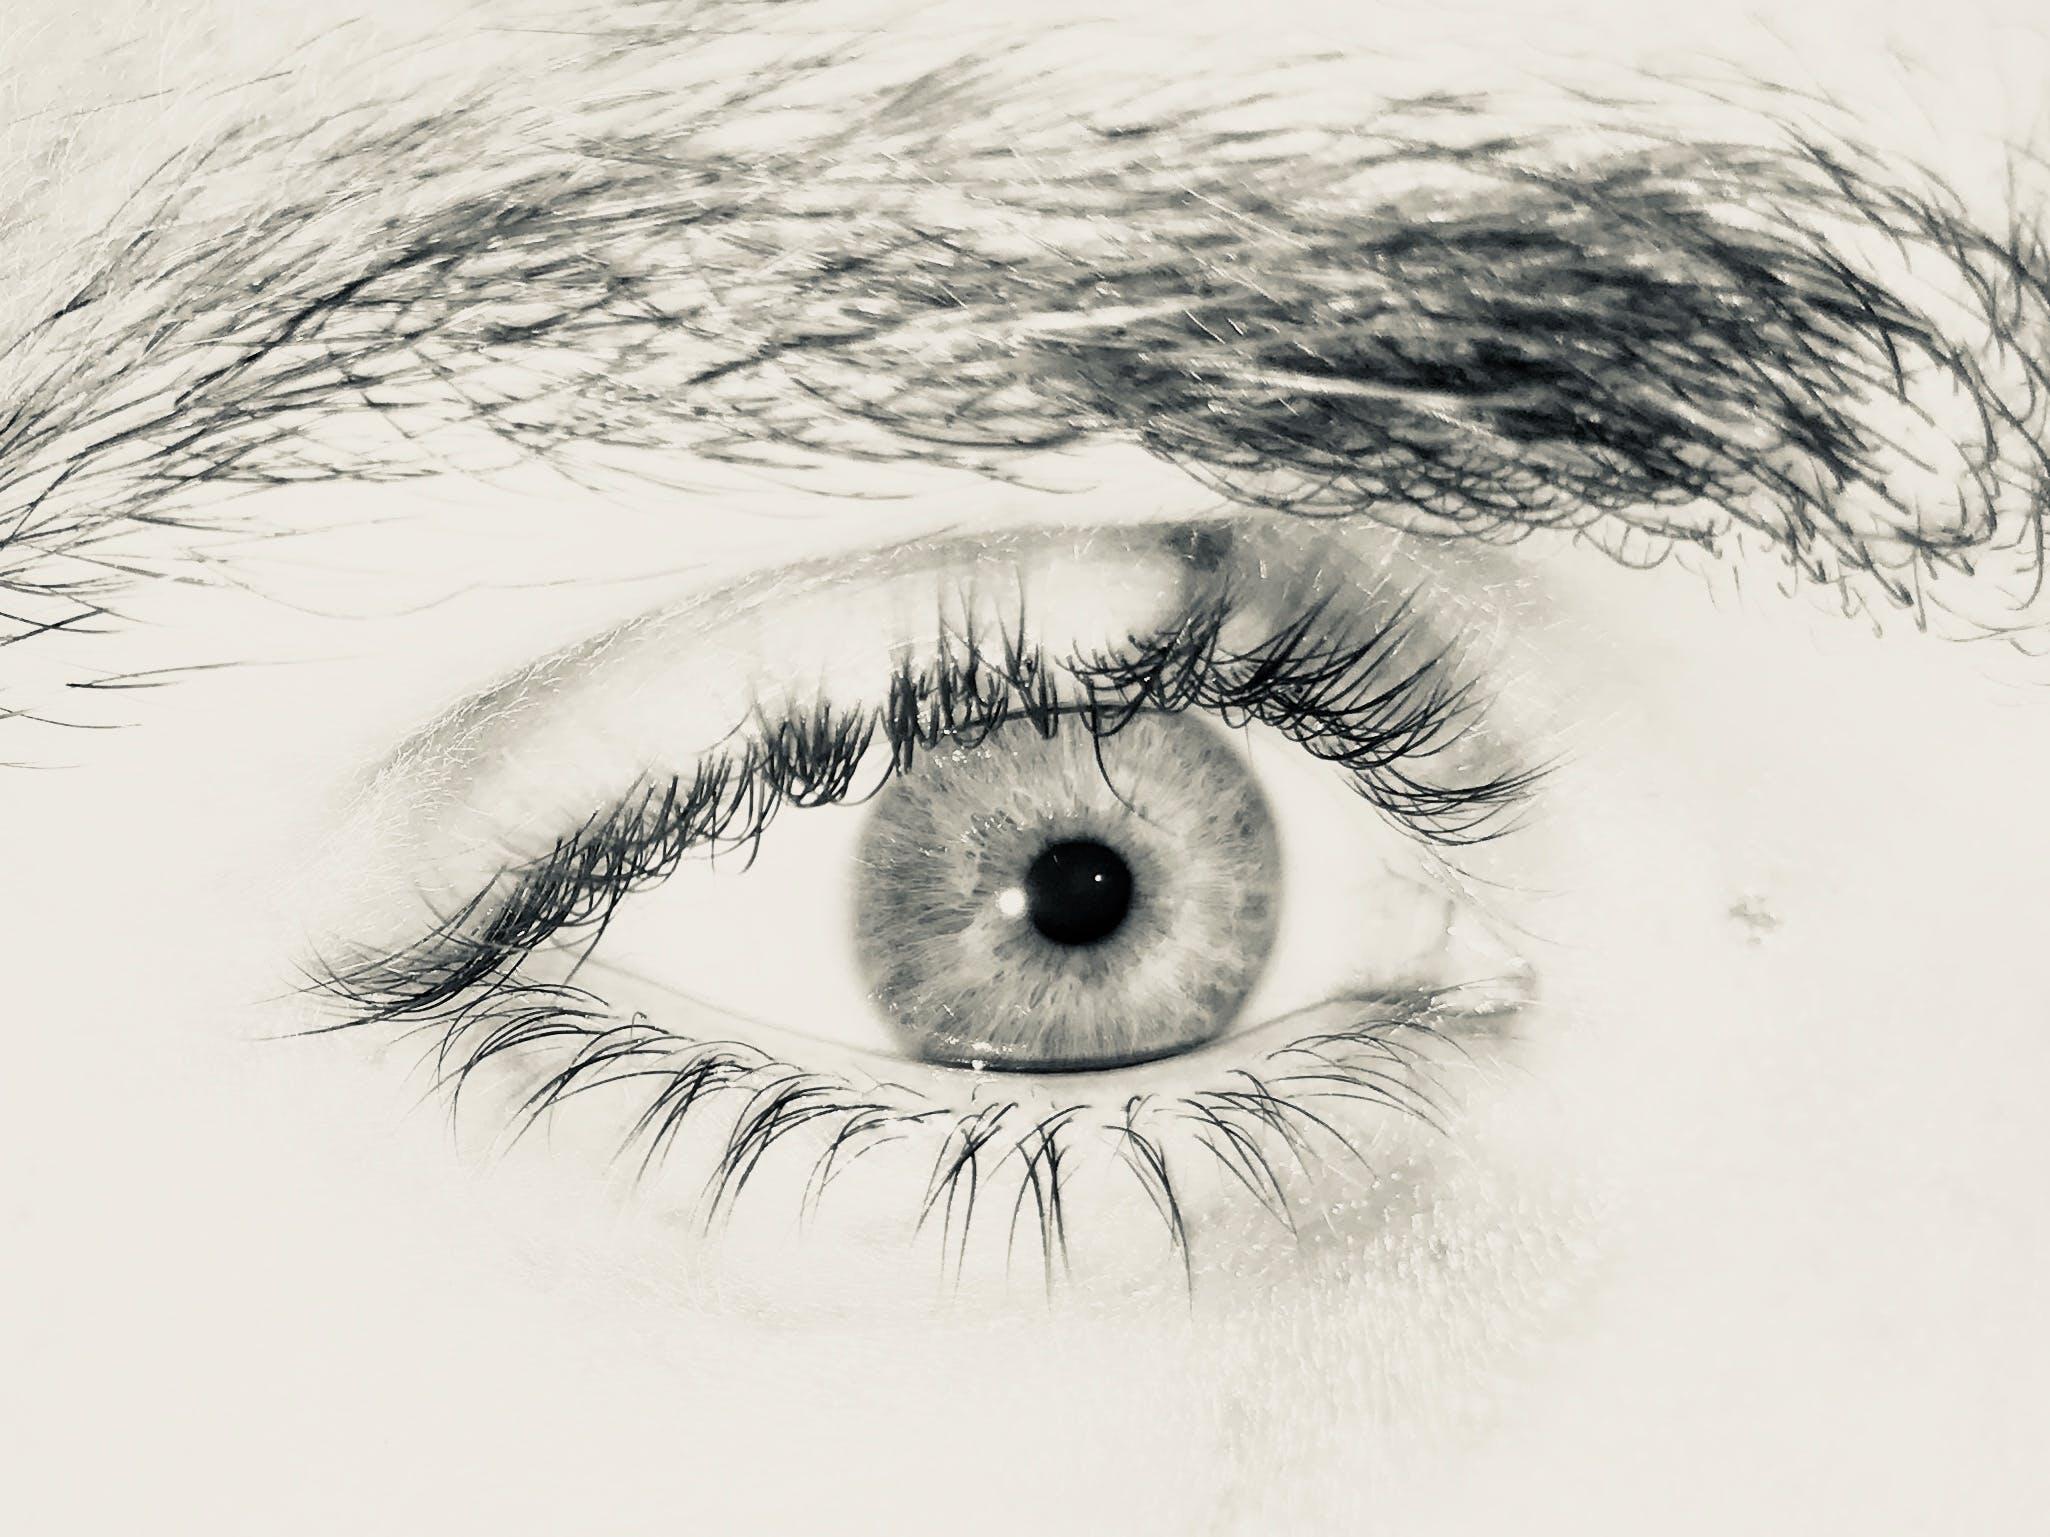 Free stock photo of black and white, blinking, eye, eyebrow